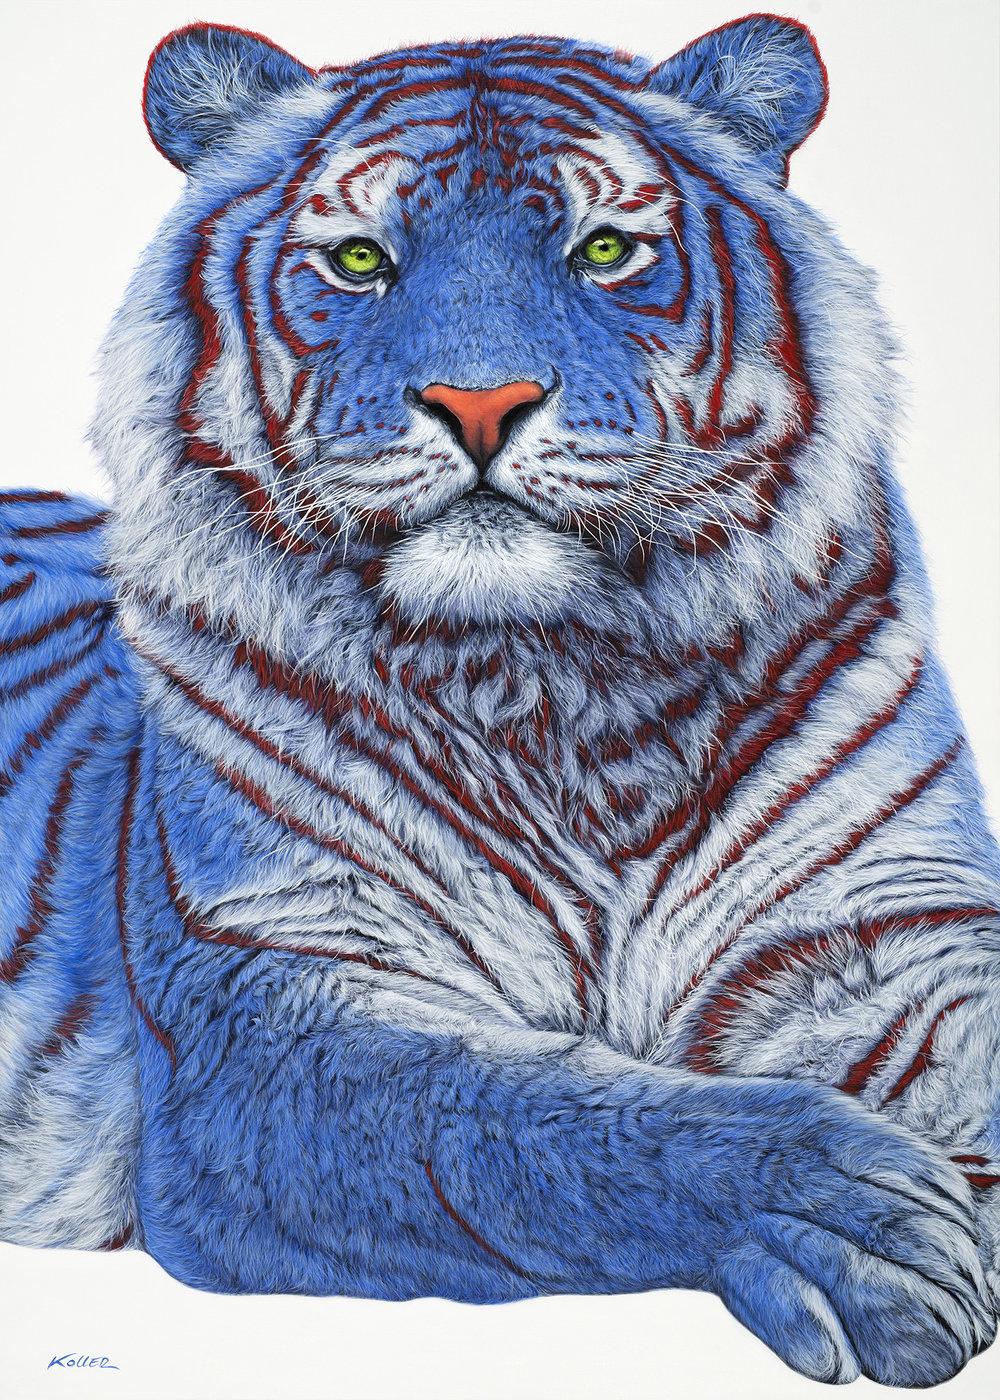 Copy of Helmut Koller, Siberian Tiger in Blue